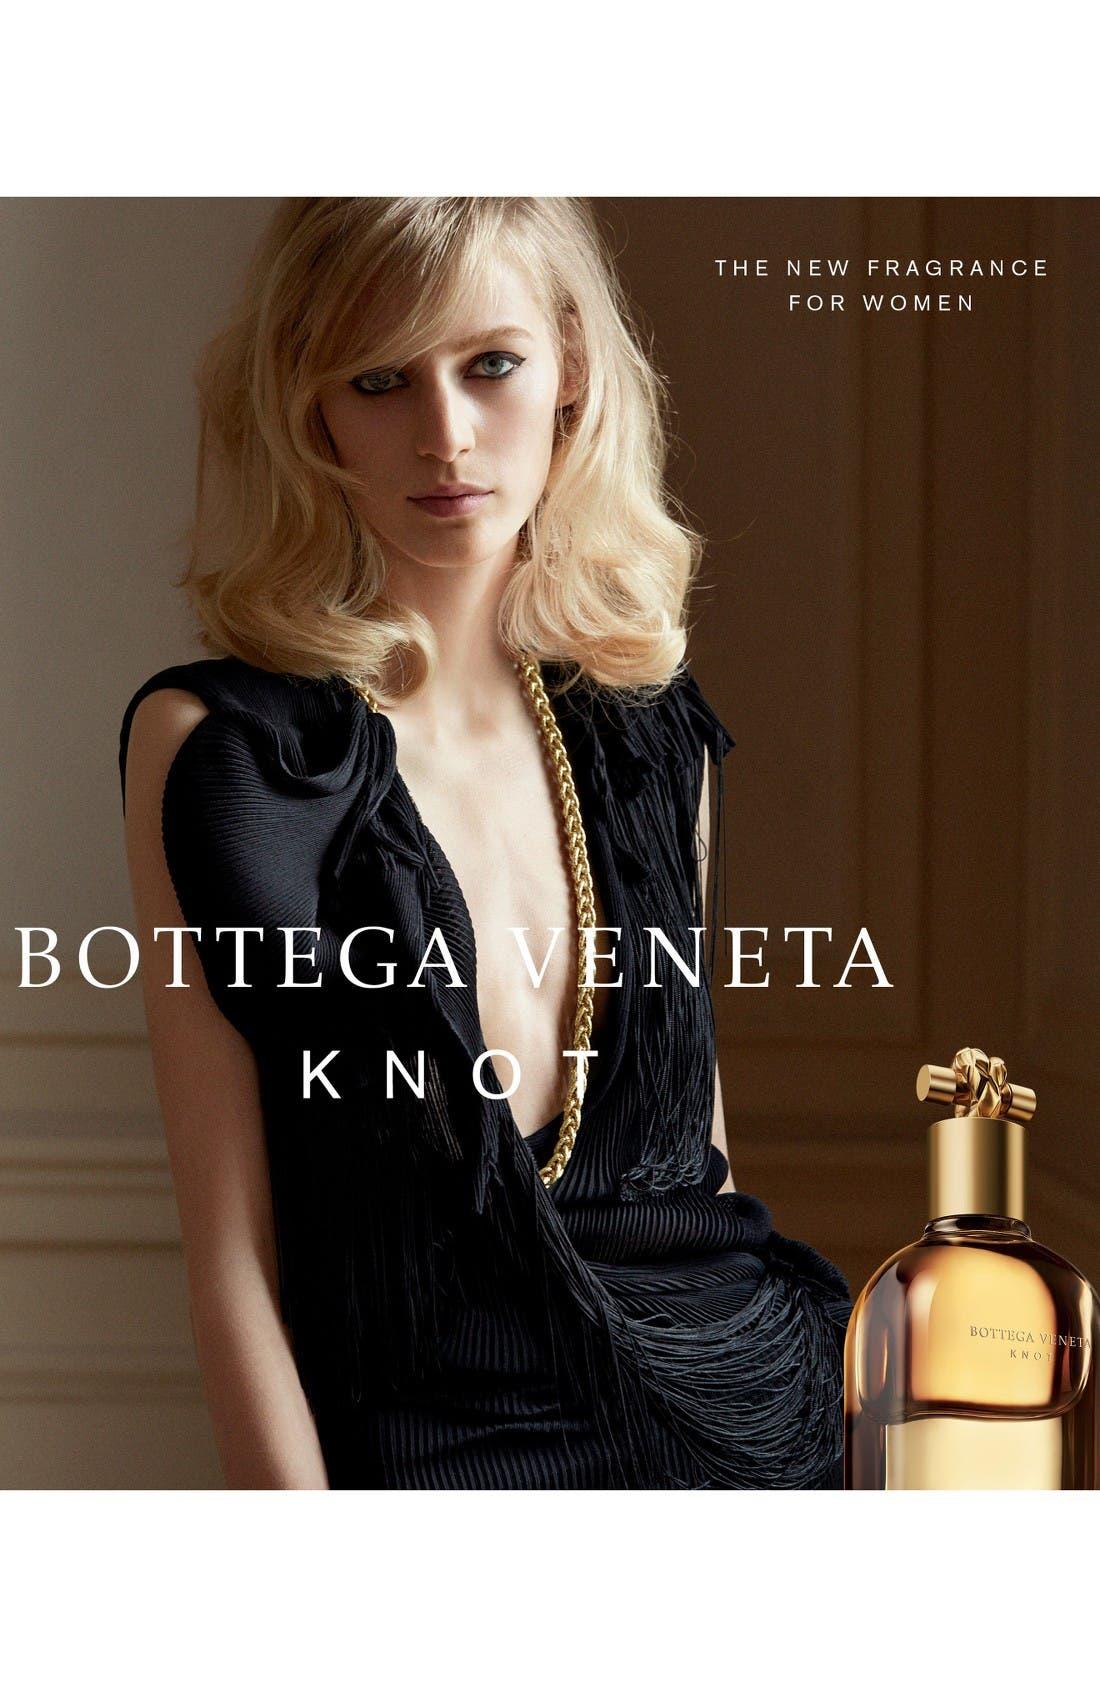 Alternate Image 2  - Bottega Veneta 'Knot' Eau de Parfum Spray